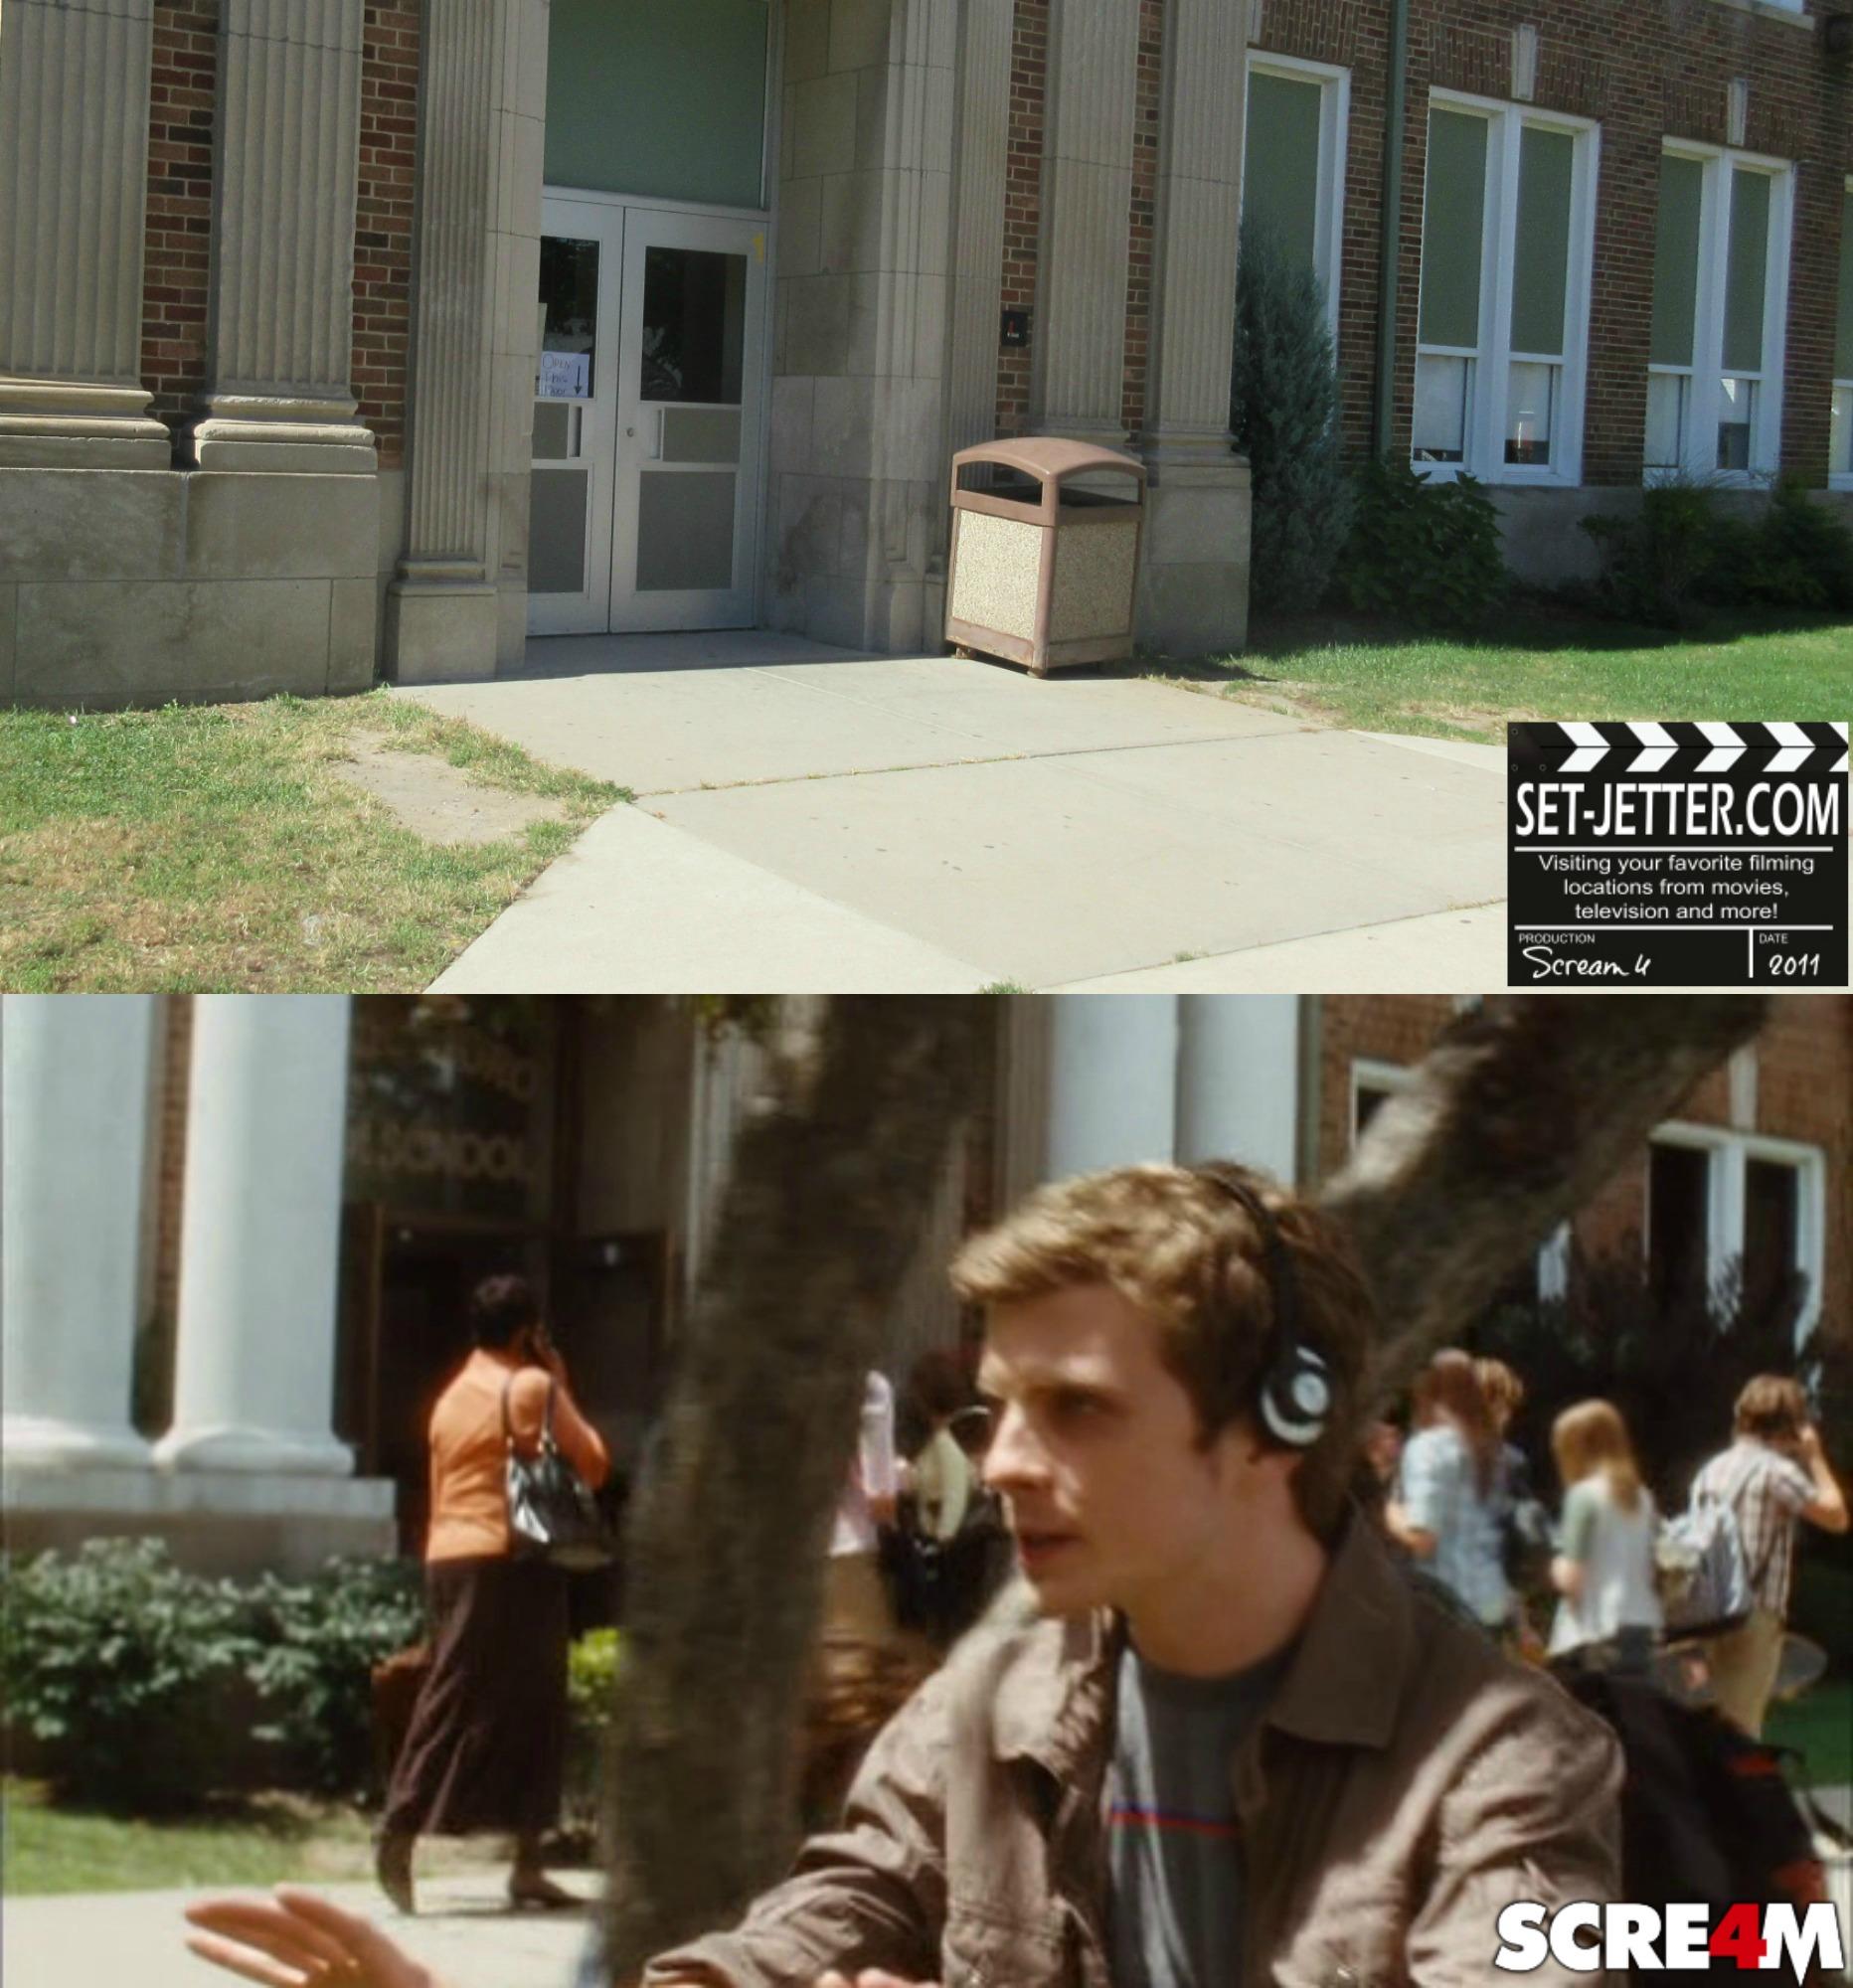 Scream4 comparison 63.jpg